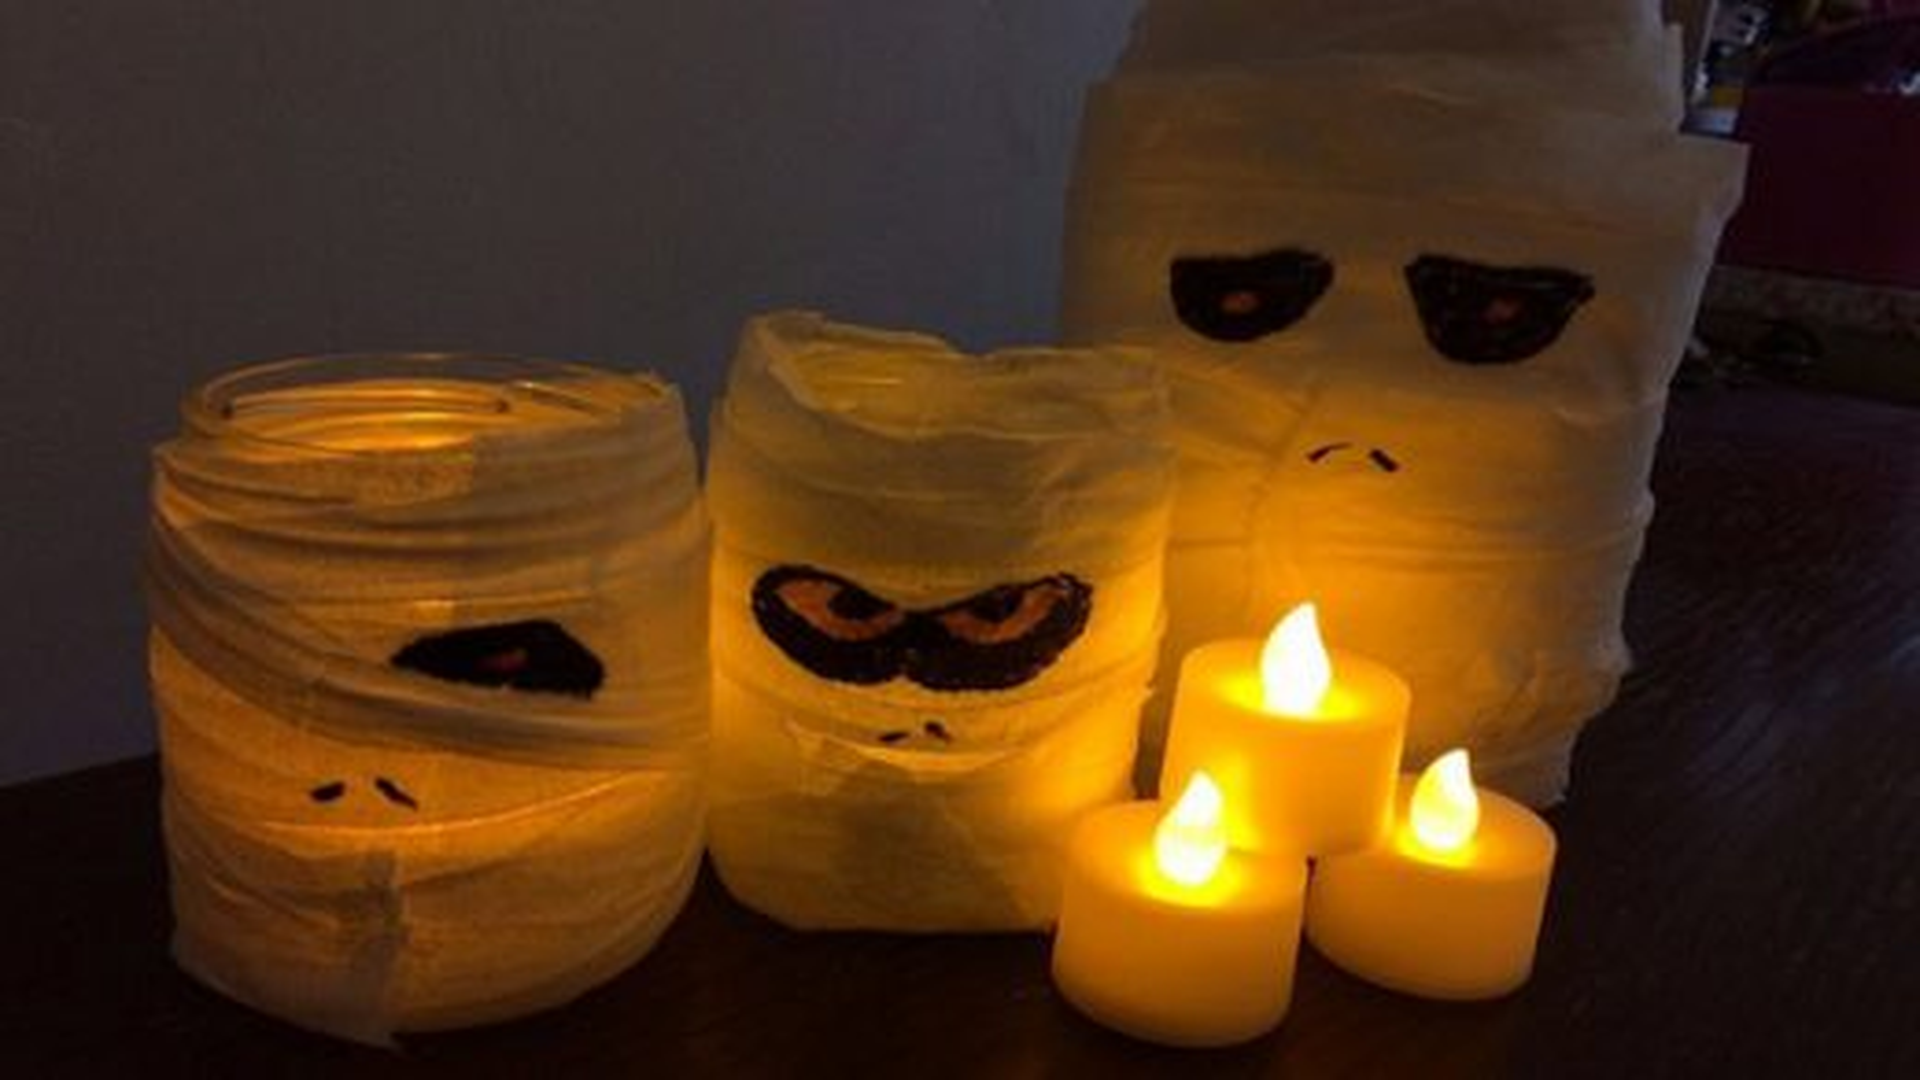 جا شمعی مومیایی | تگ